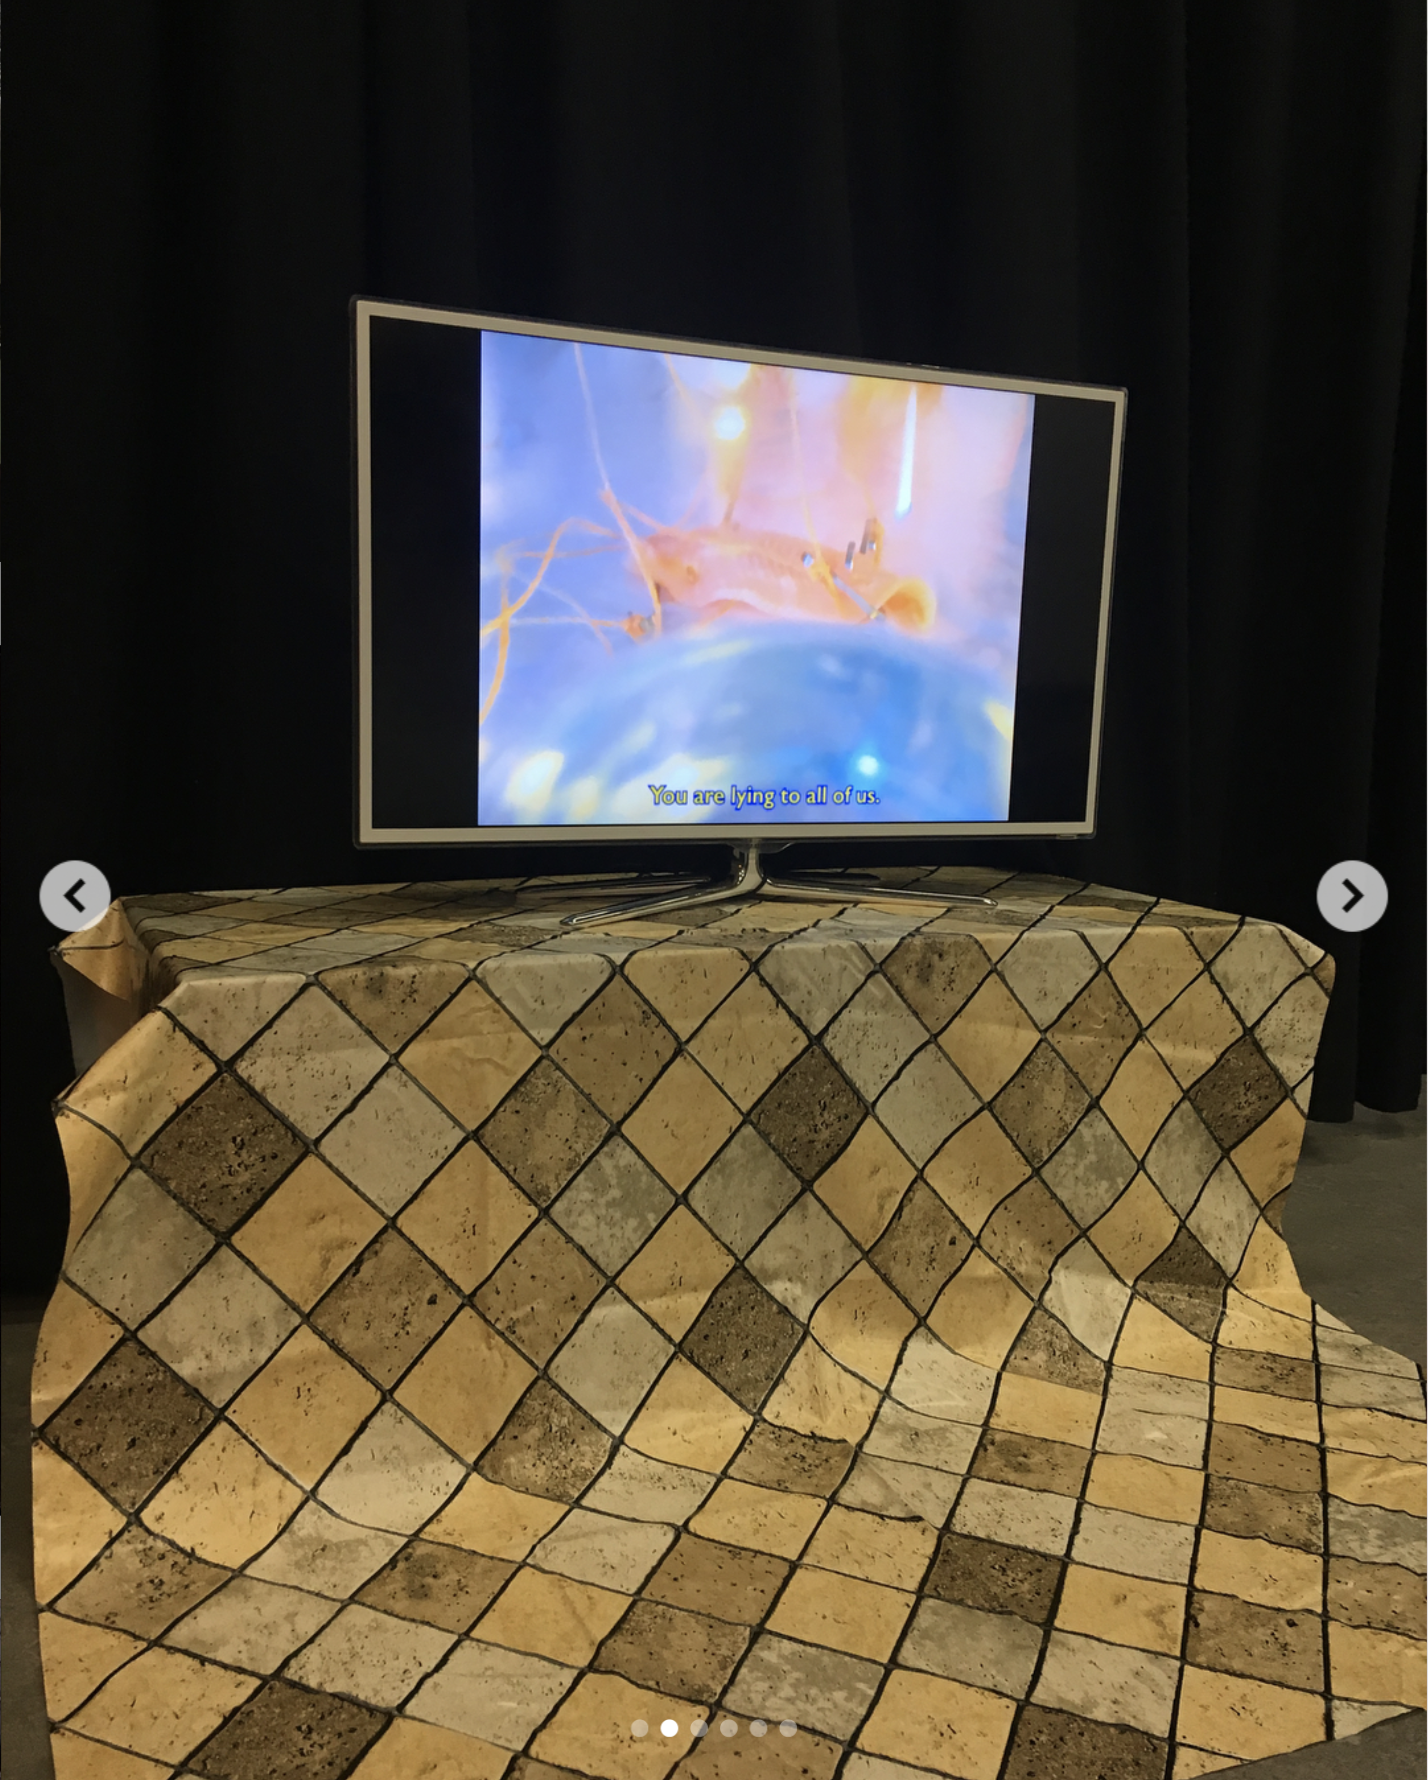 Documentation of video installation